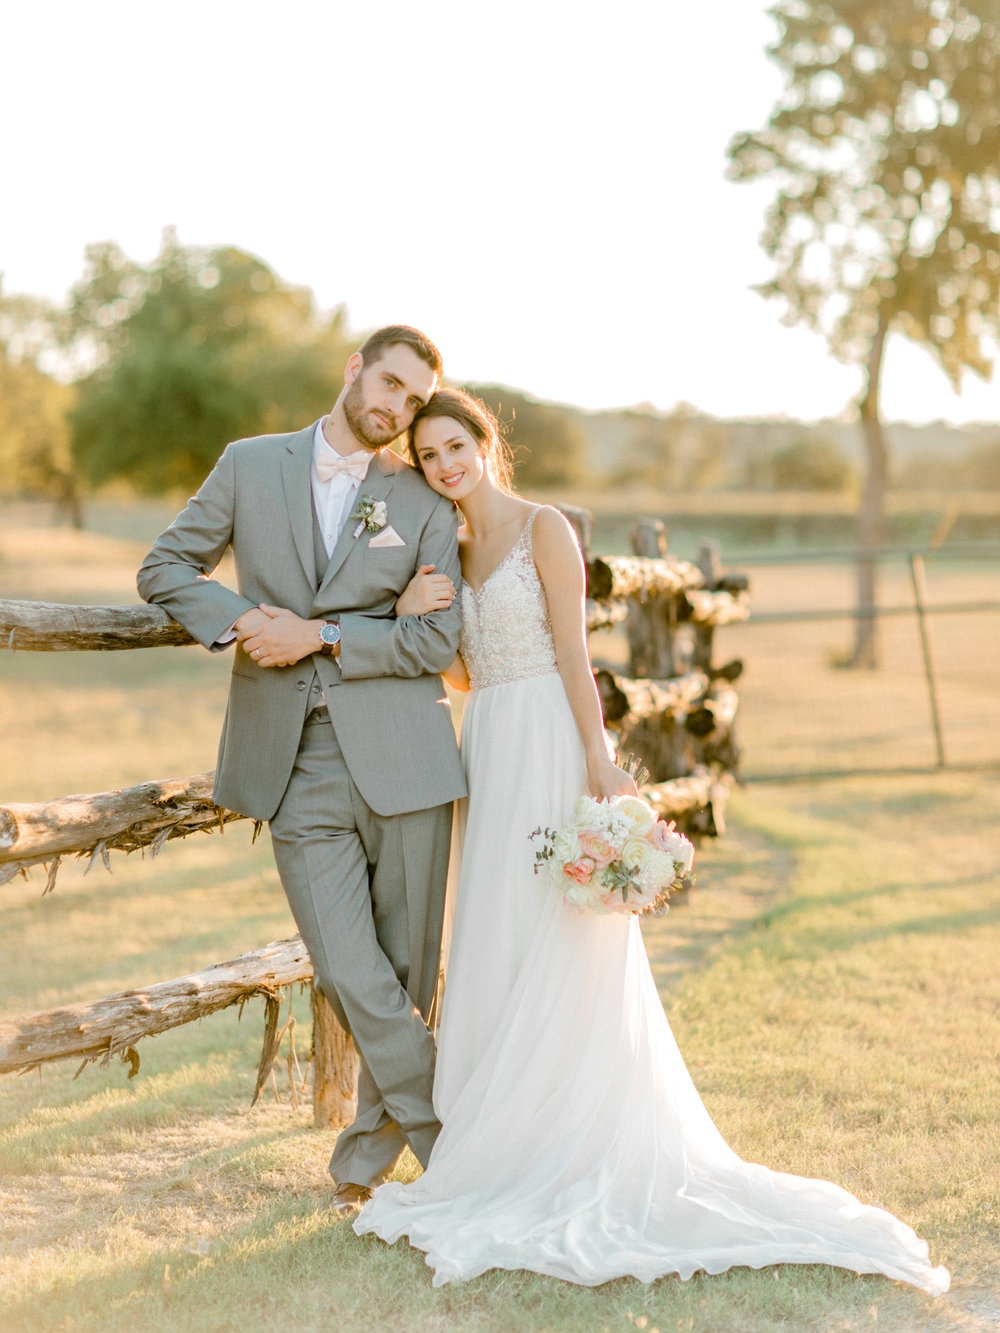 honey-hollow-ranch-wedding-34.jpg